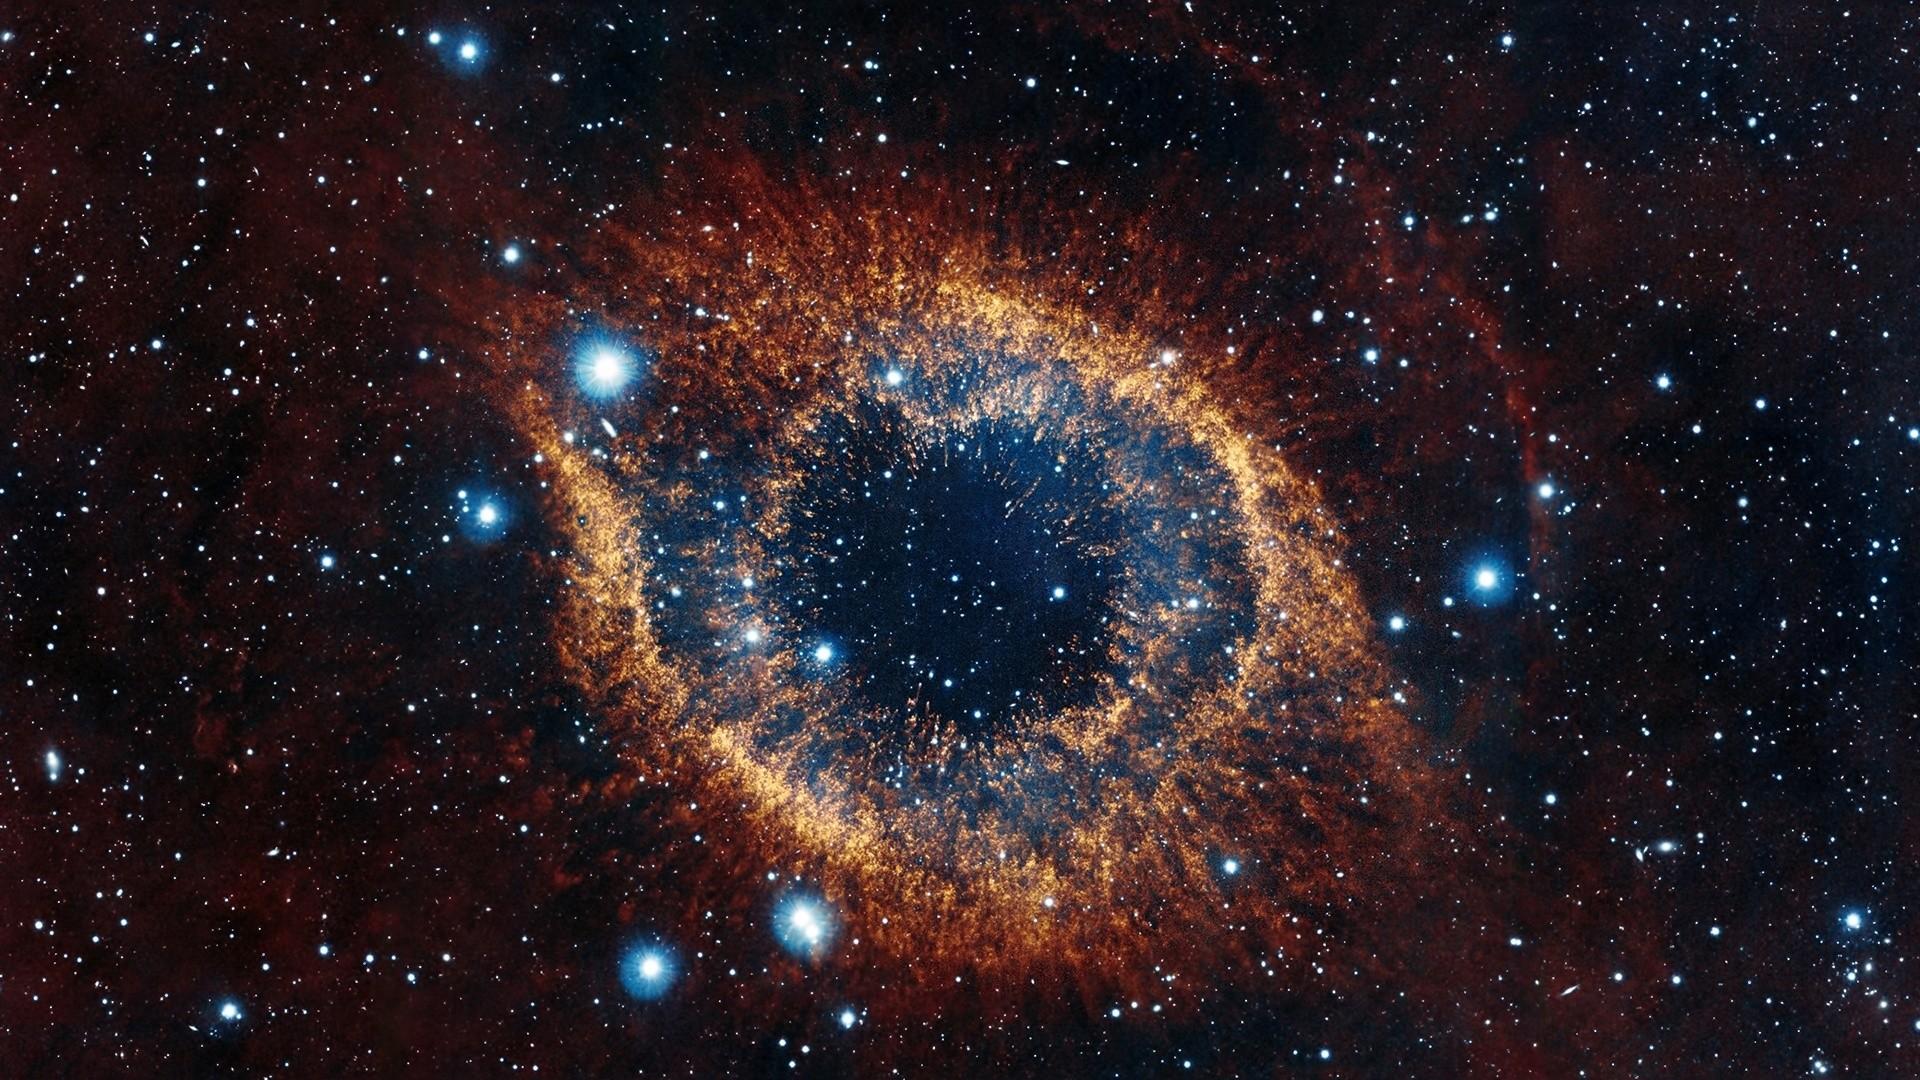 helix_nebula_space_stars_explosion_brilliance_9